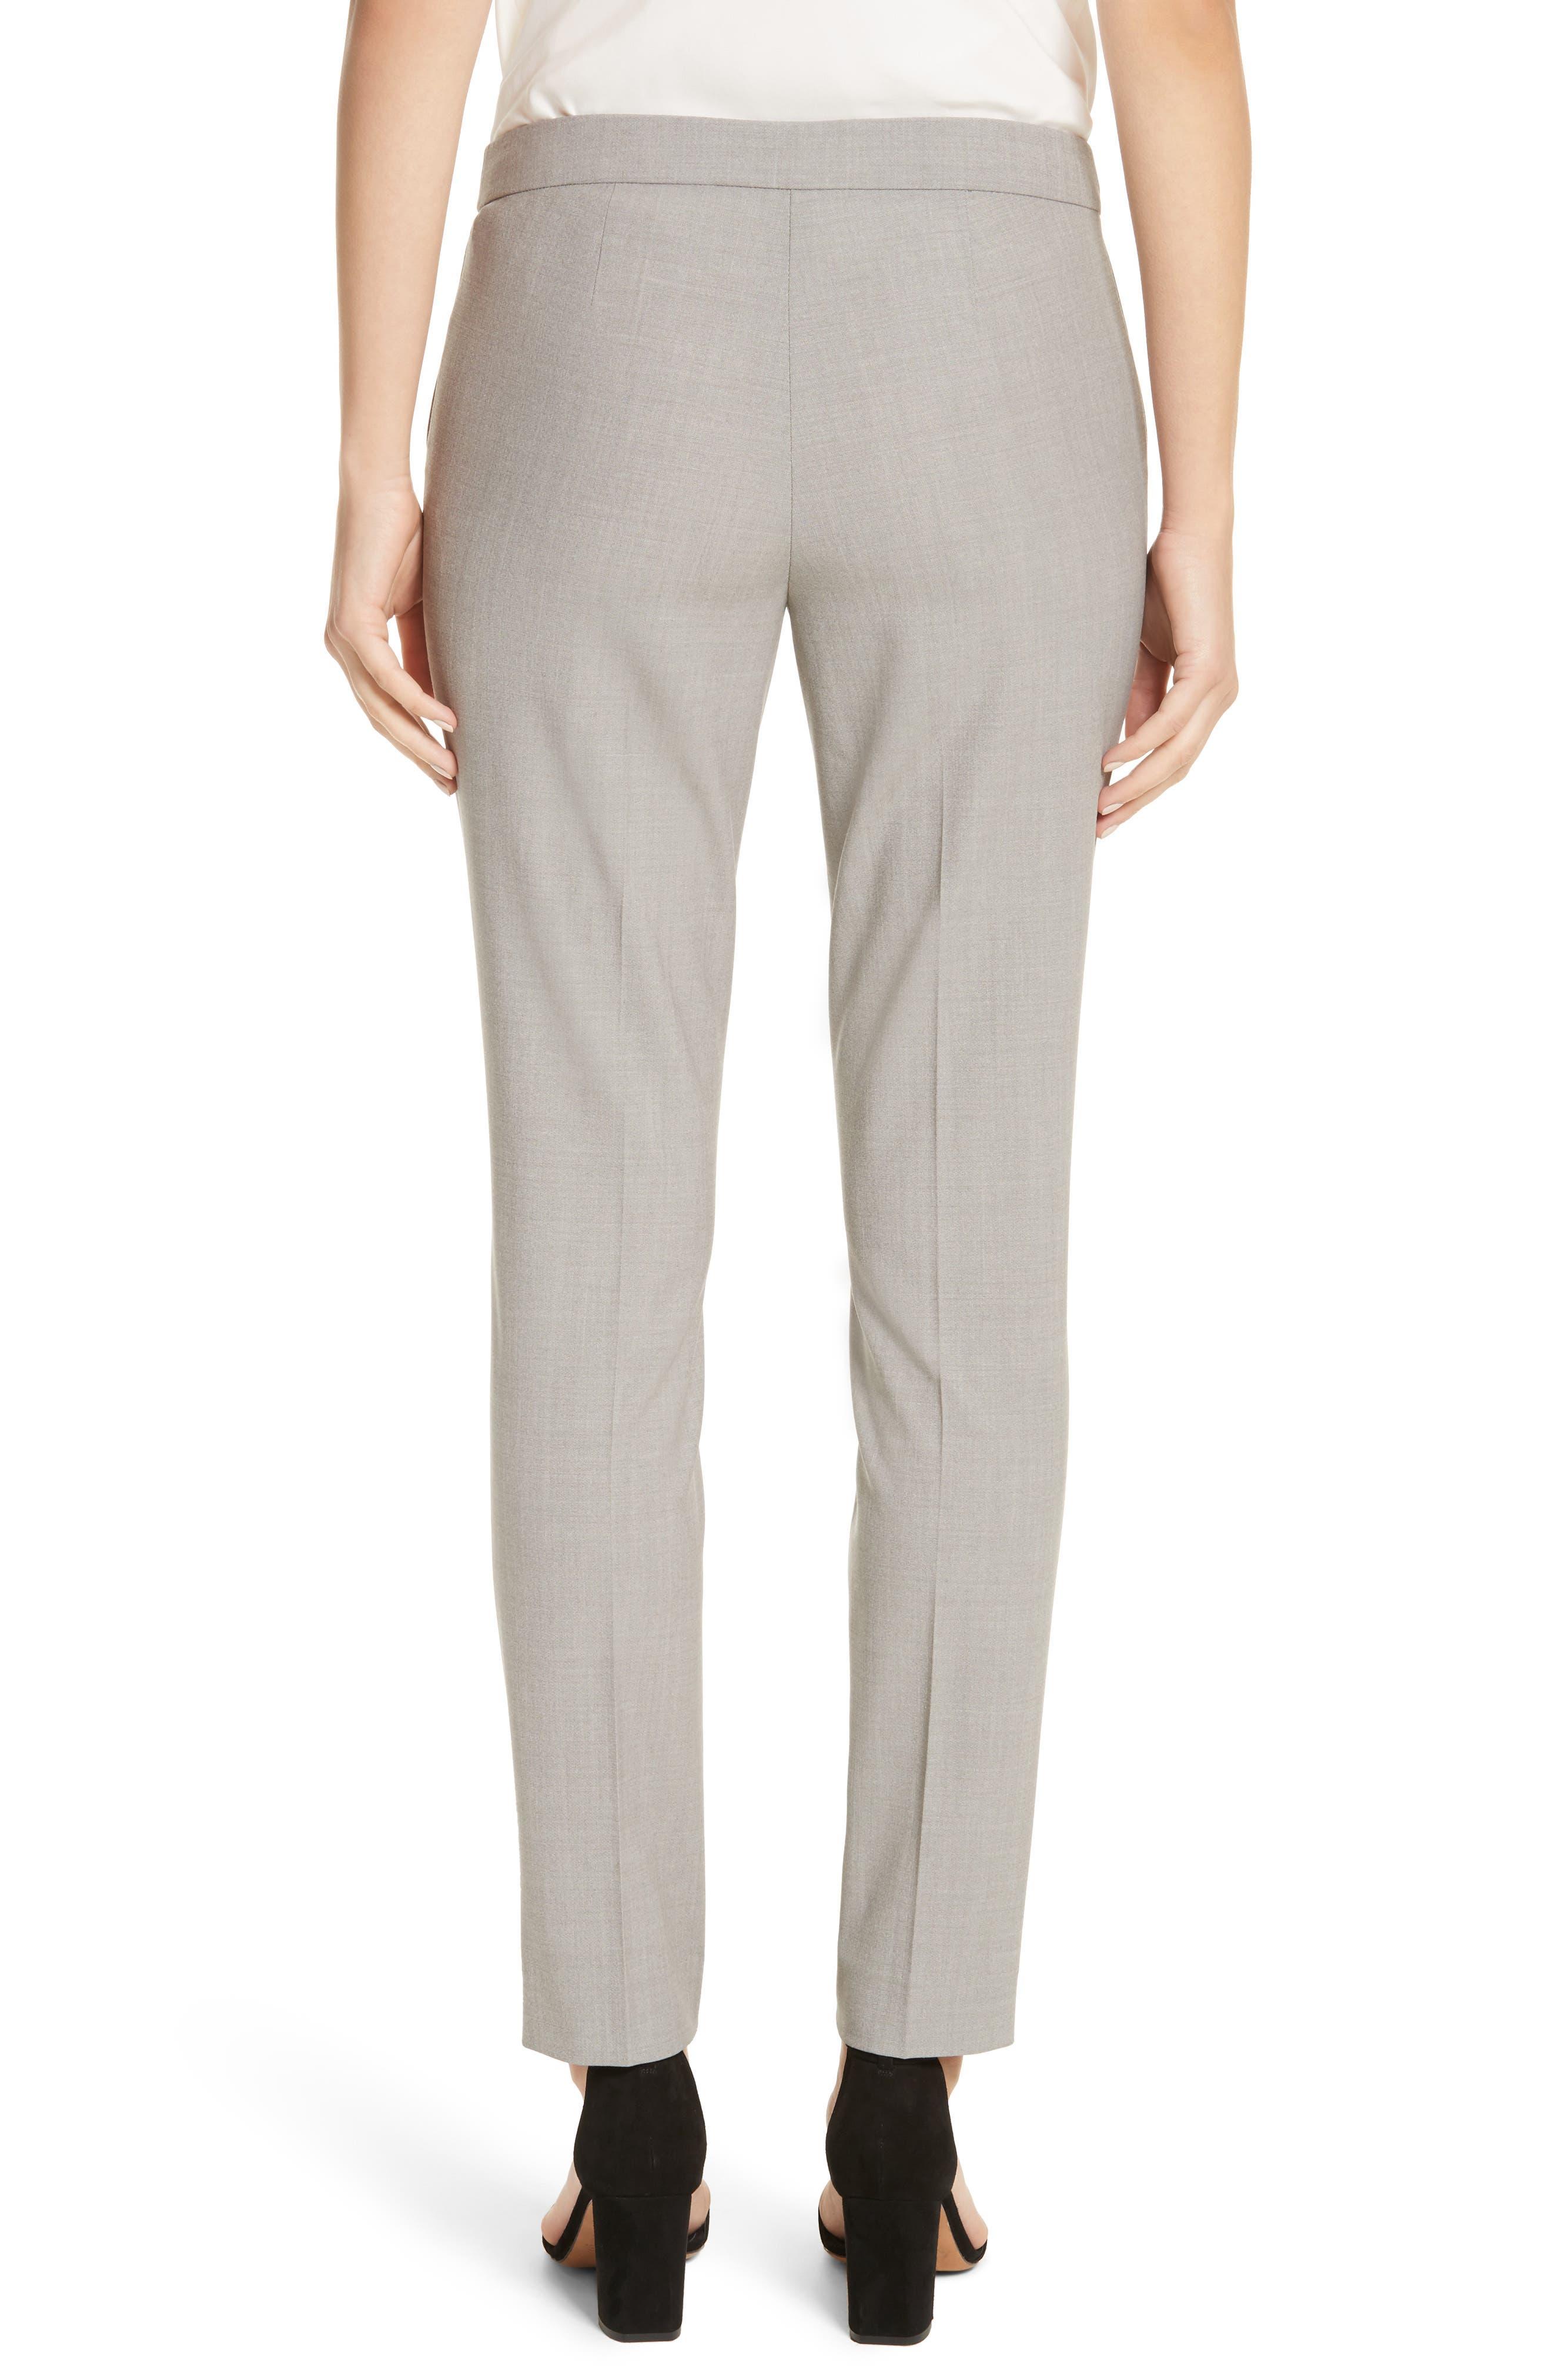 Manhattan Slim Pants,                             Alternate thumbnail 2, color,                             Feather Grey Melange